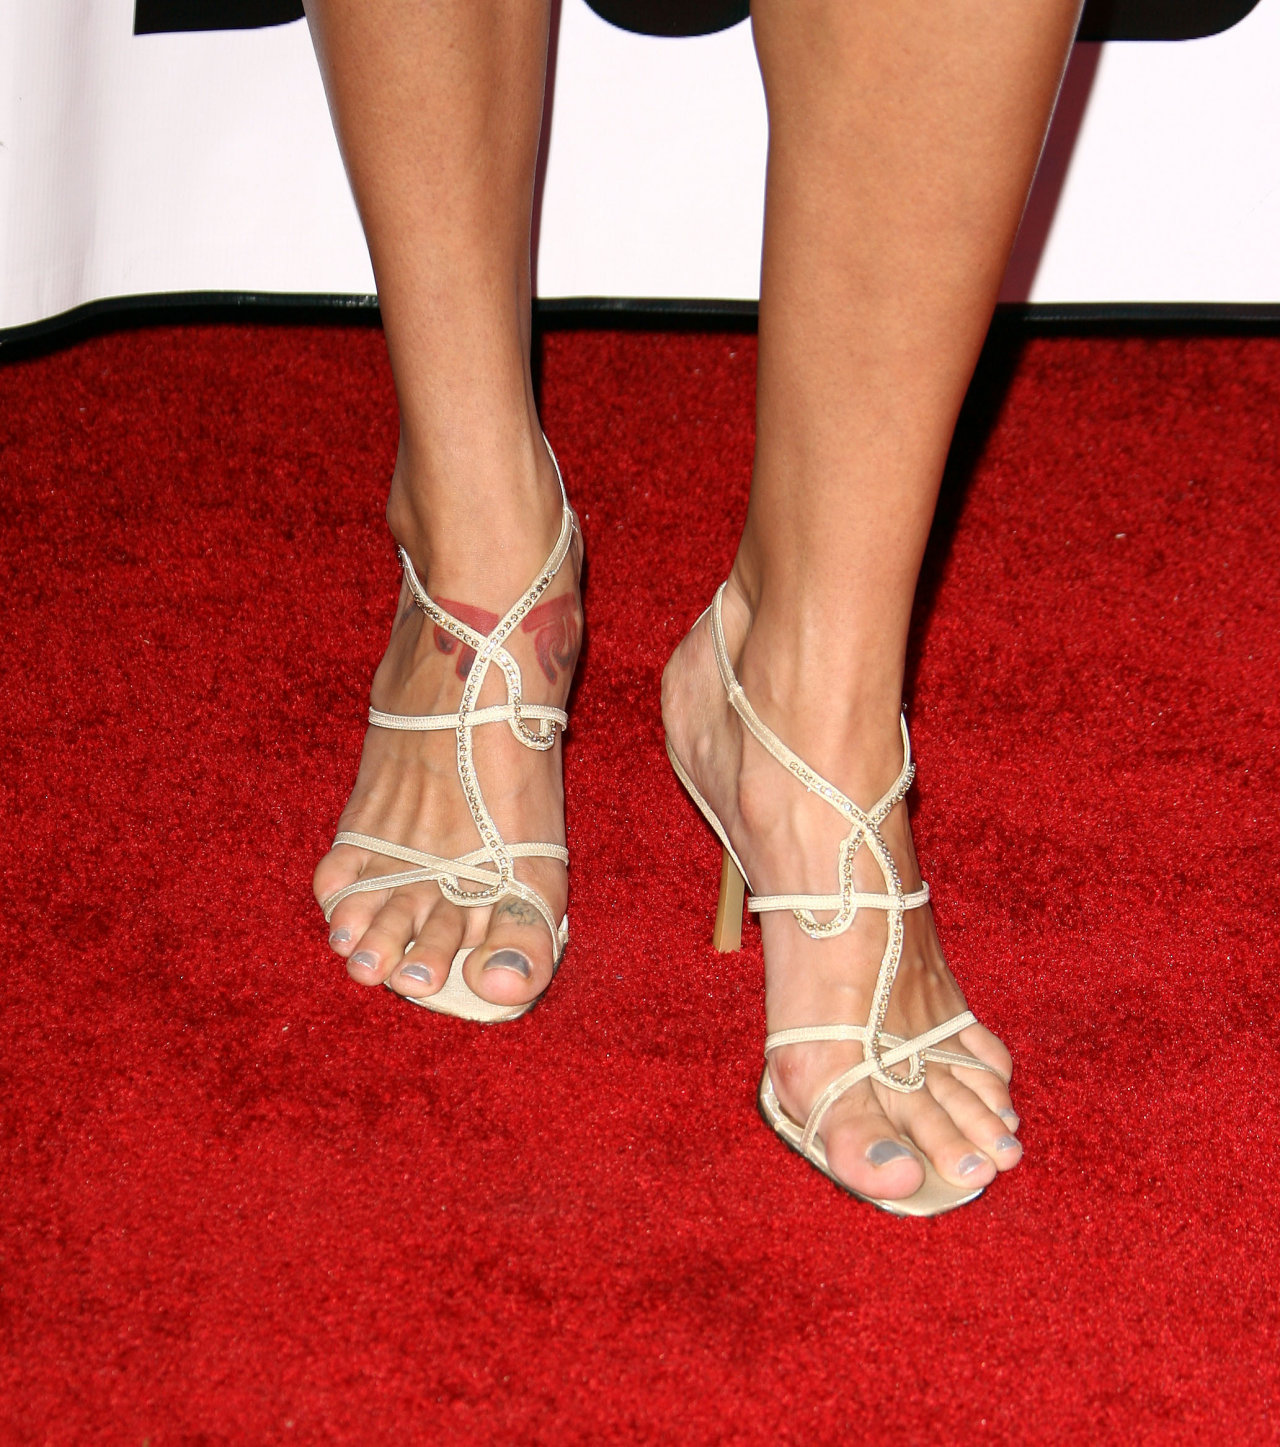 Hollywood Star Feet: Kristanna Loken Feet